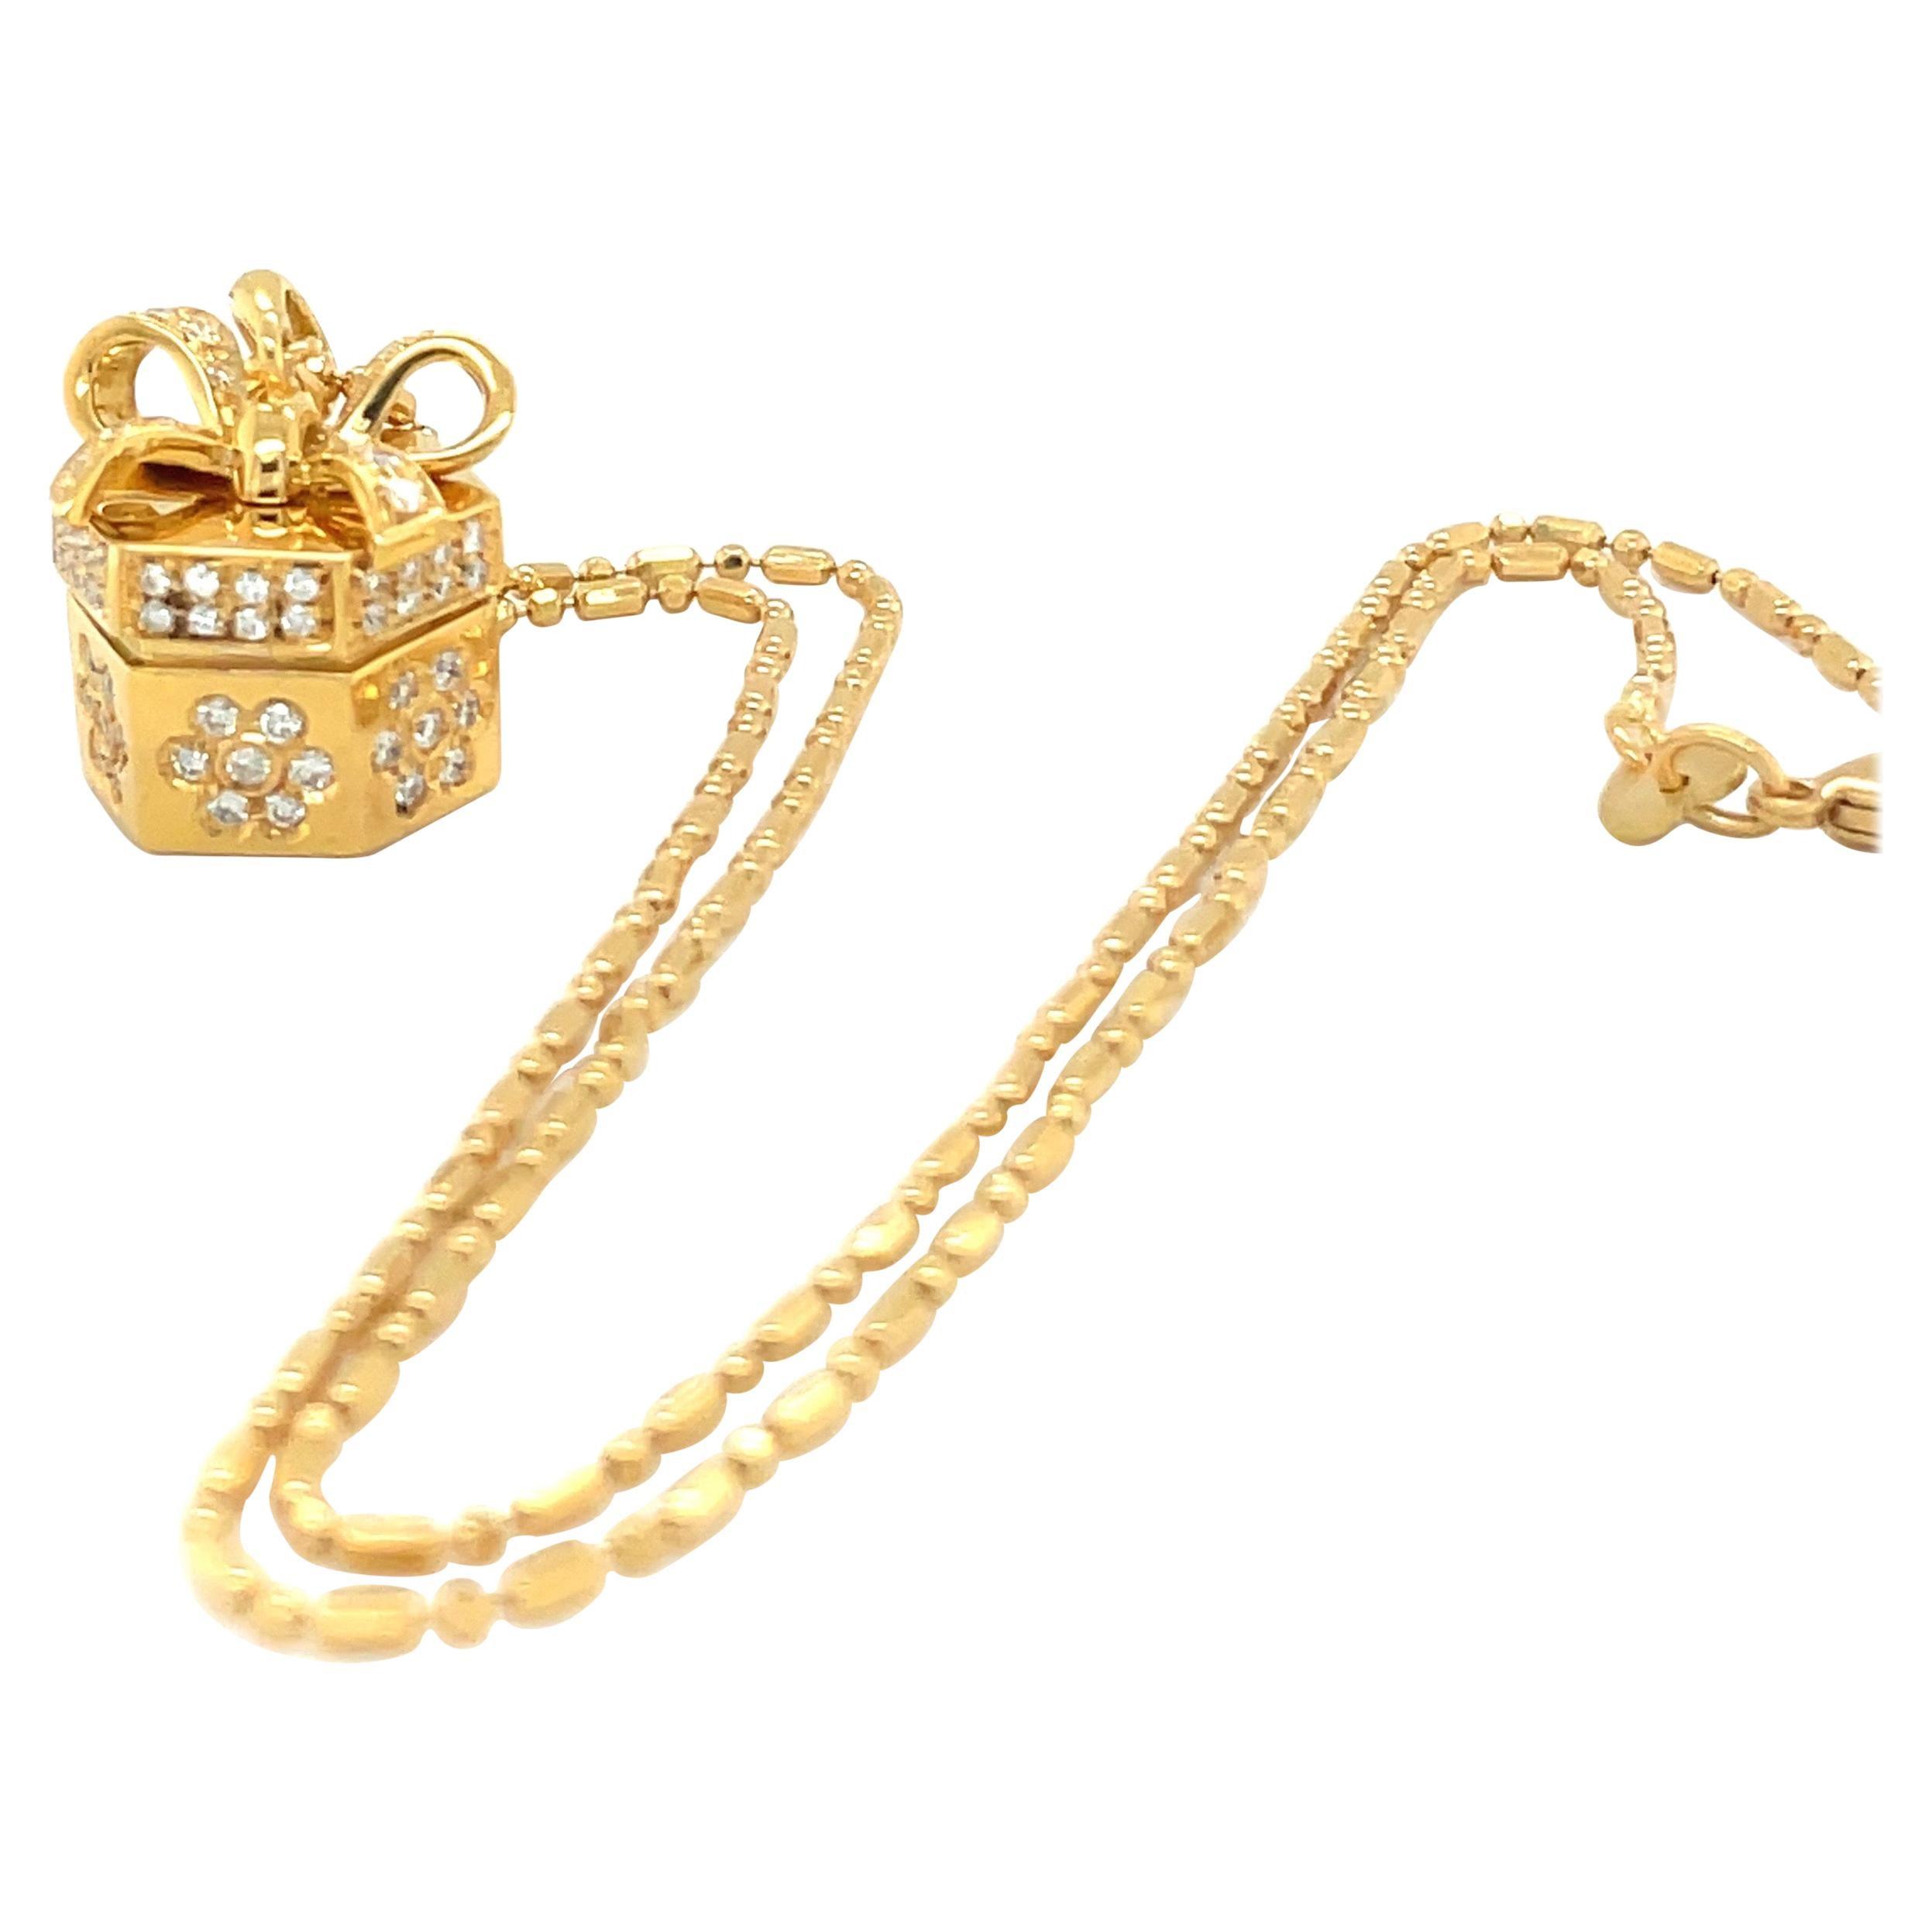 Stefan Hafner 18KT YG Diamond .62CT Ruby .19CT. Pendant Gift Box Charm Necklace